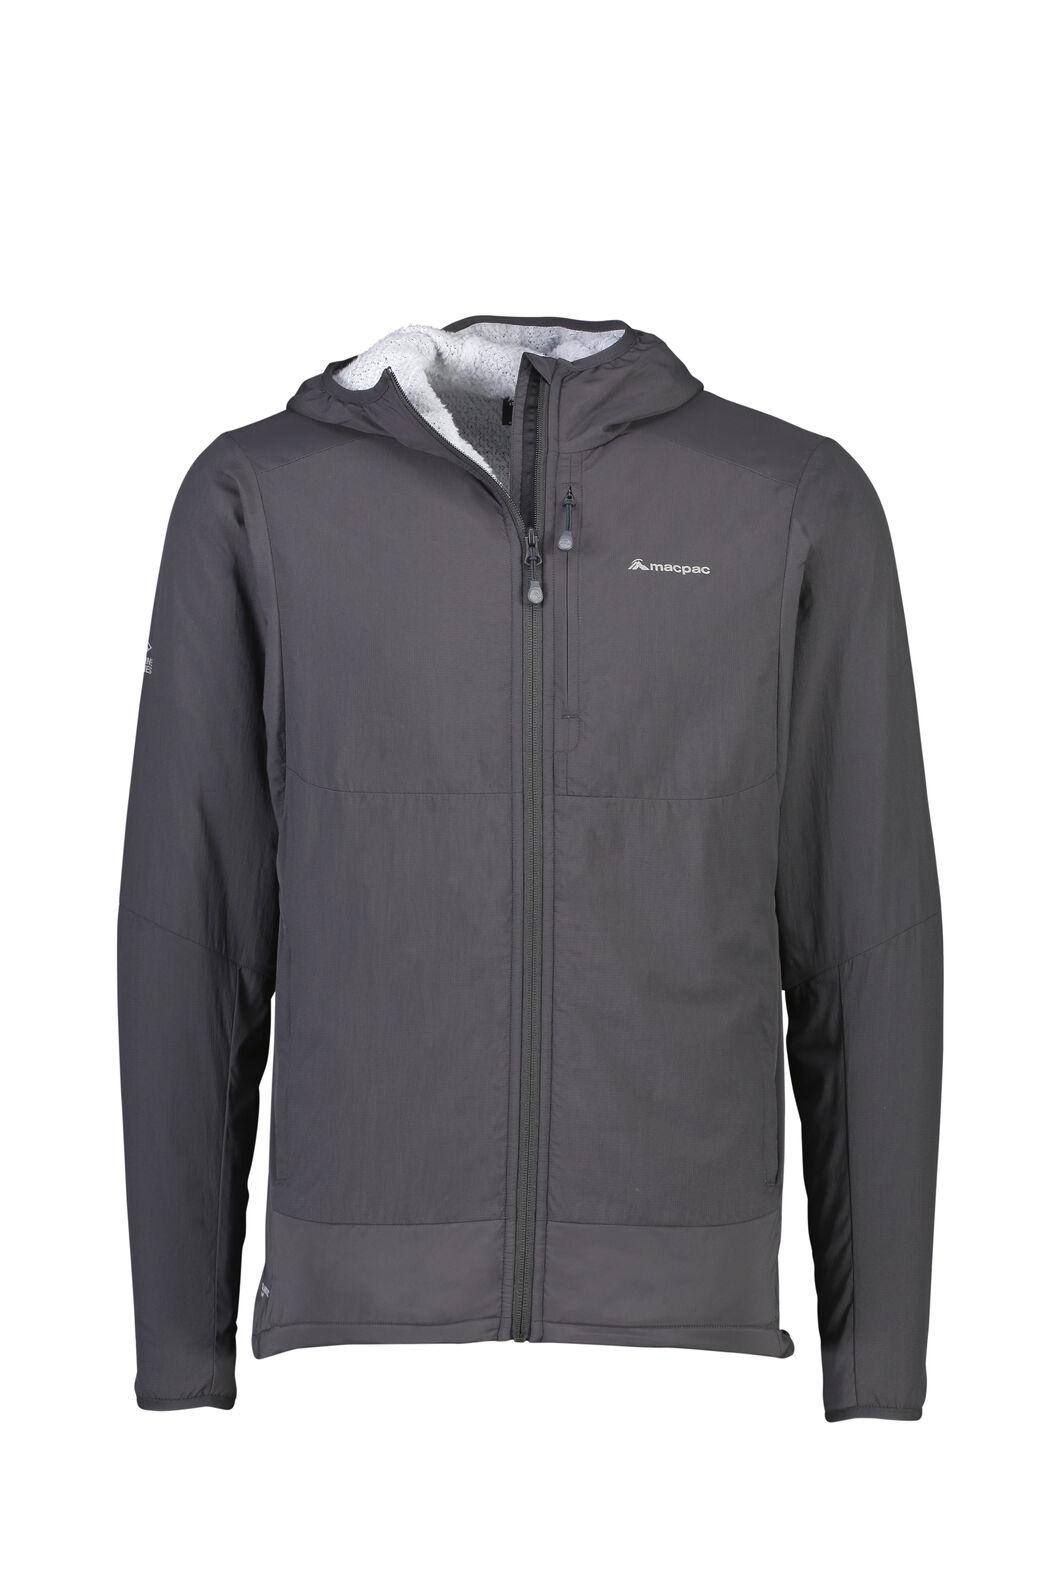 Macpac Pisa Polartec® Hooded Jacket - Men's, Phantom, hi-res